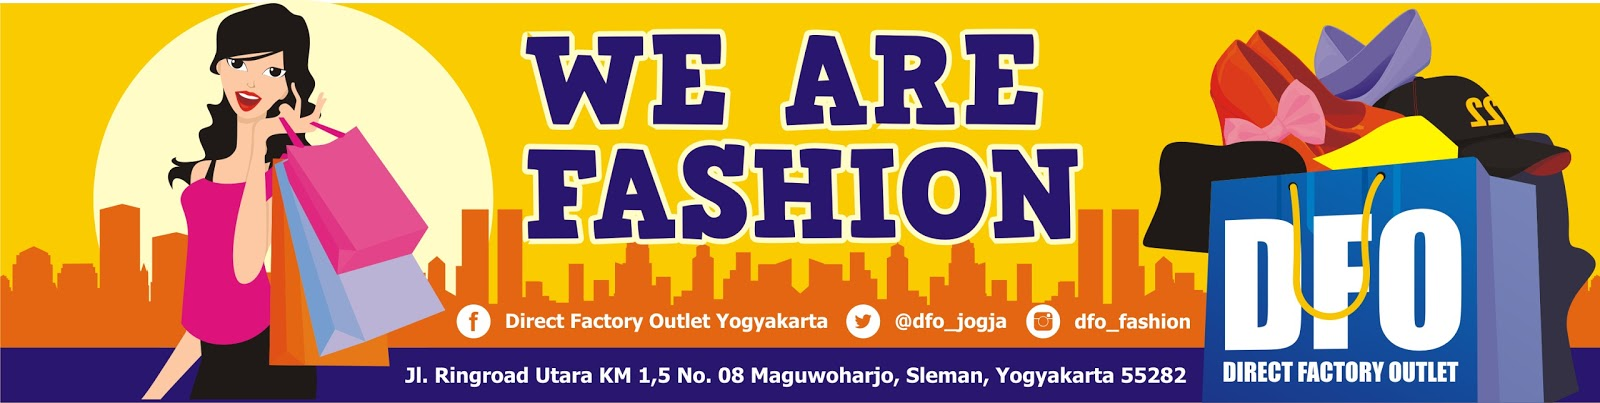 Lowongan Kerja Accounting Kasir Dan Shopkeeper Di Direct Factory Outlet Yogyakarta Puls4 Us